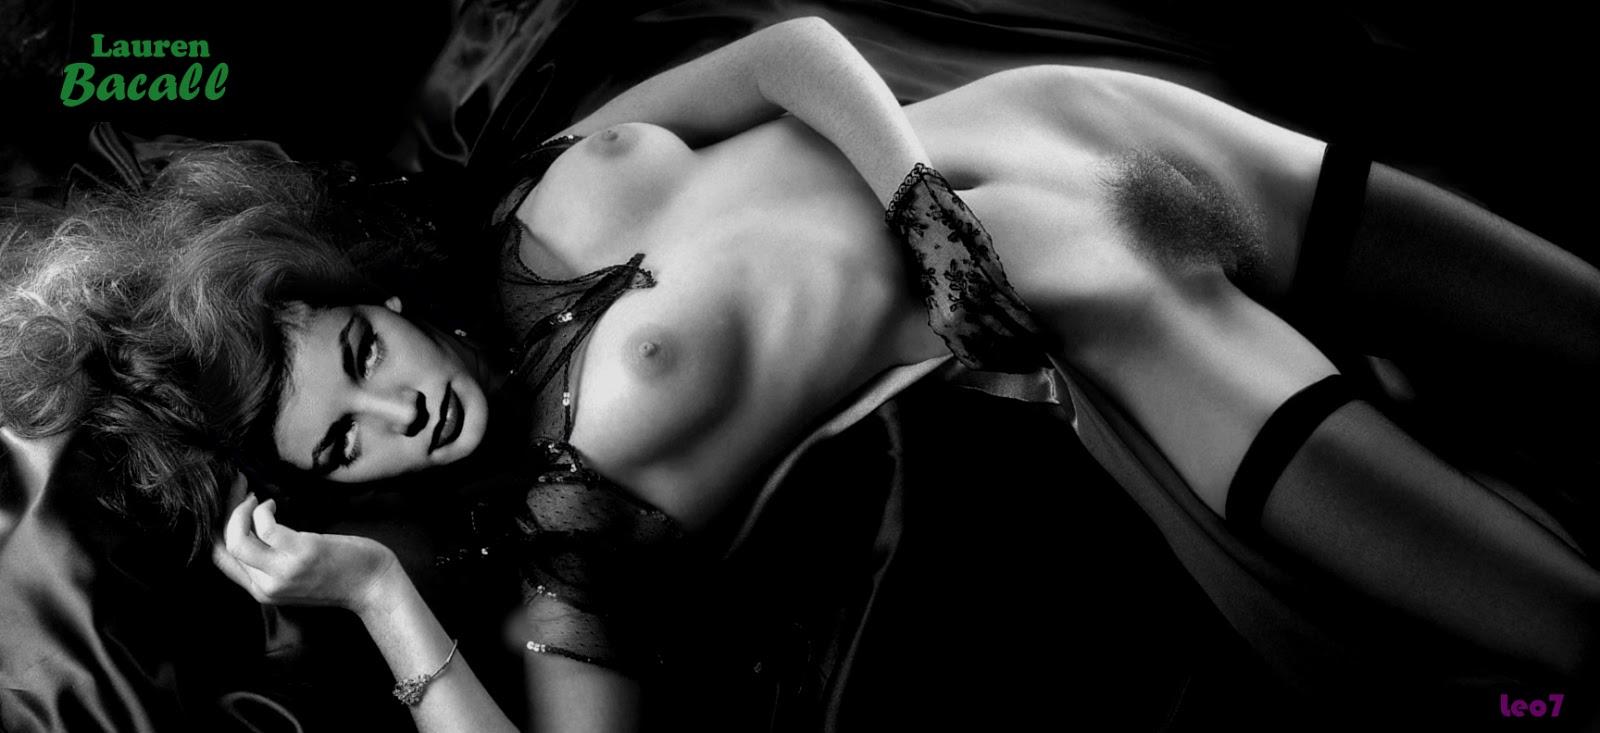 Lauren bacall nude fakes